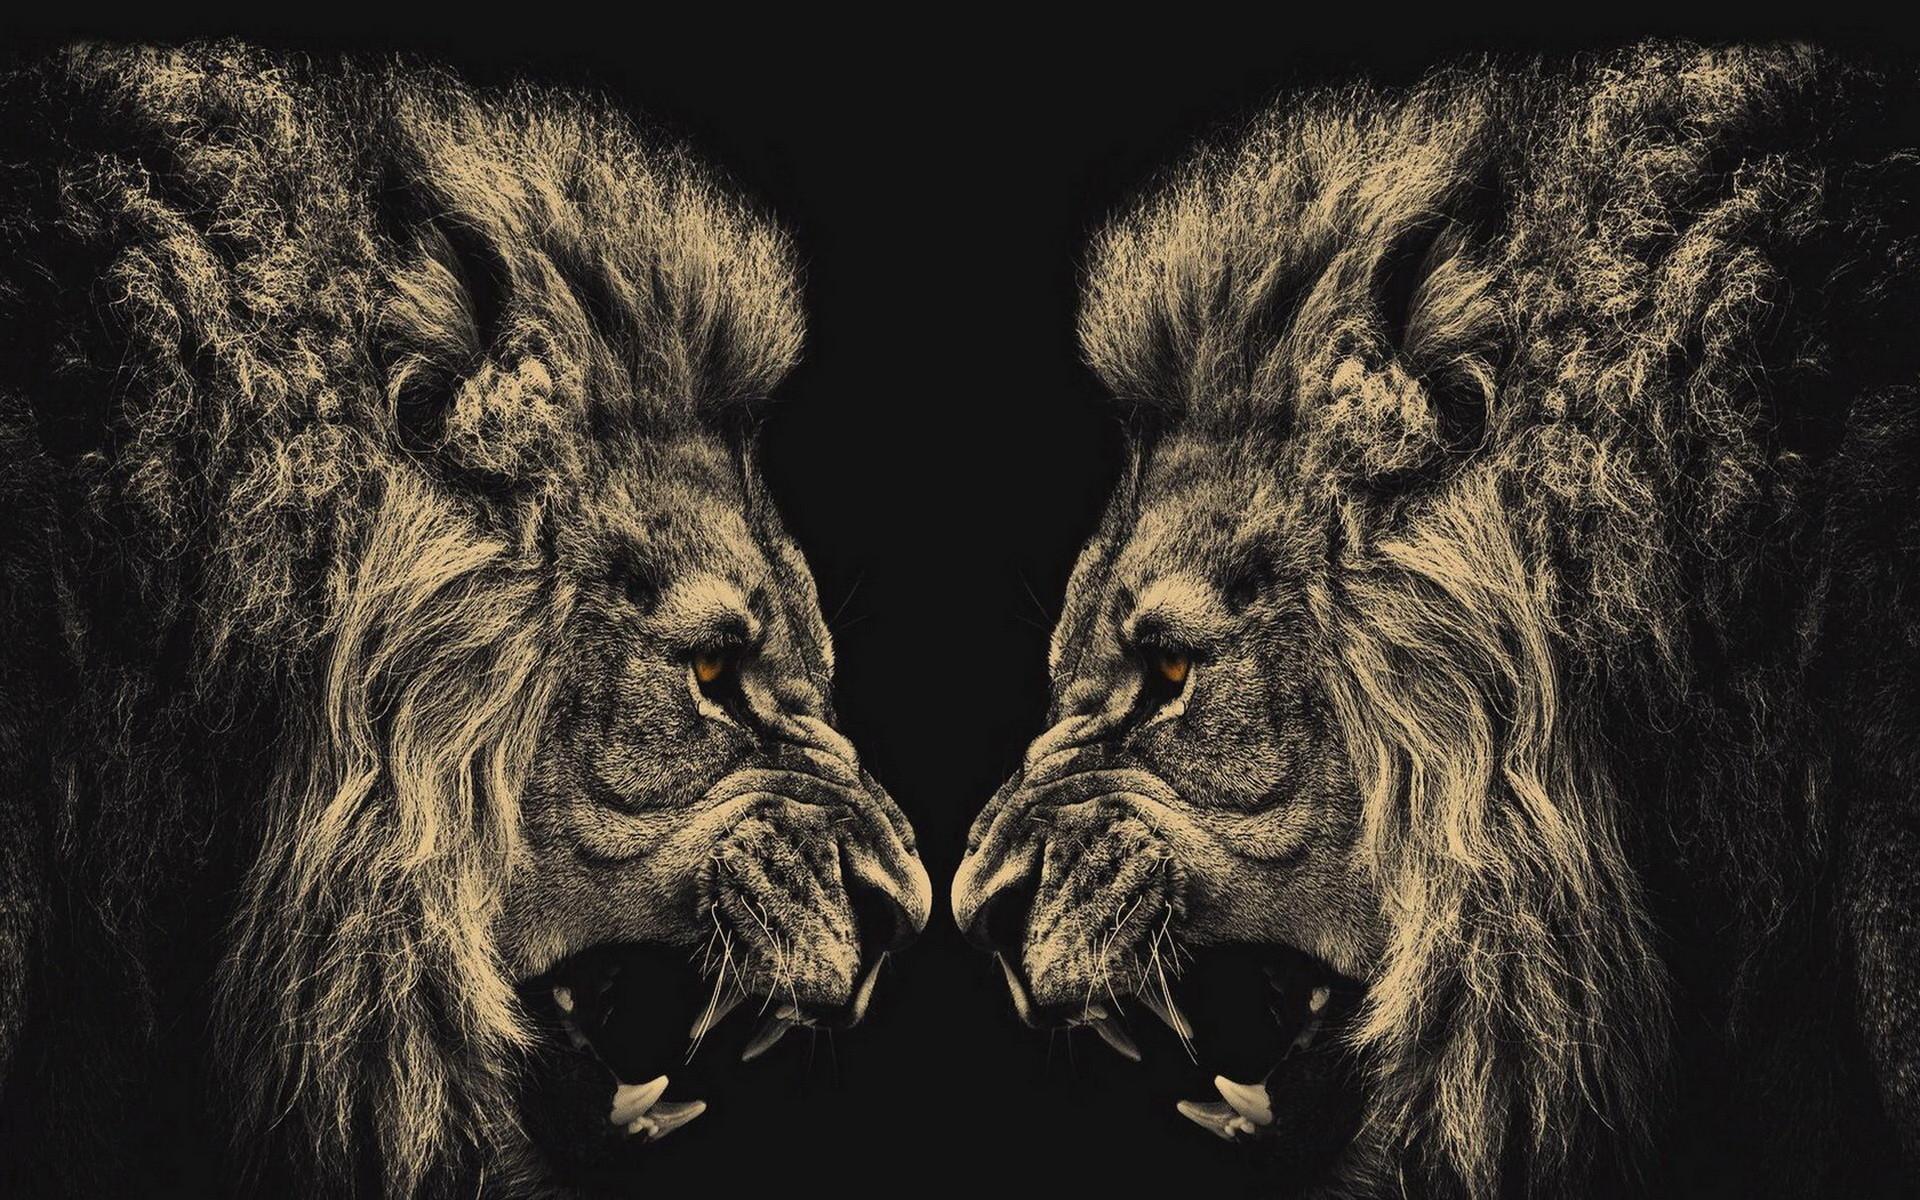 Cool Lion Wallpaper 54 Images